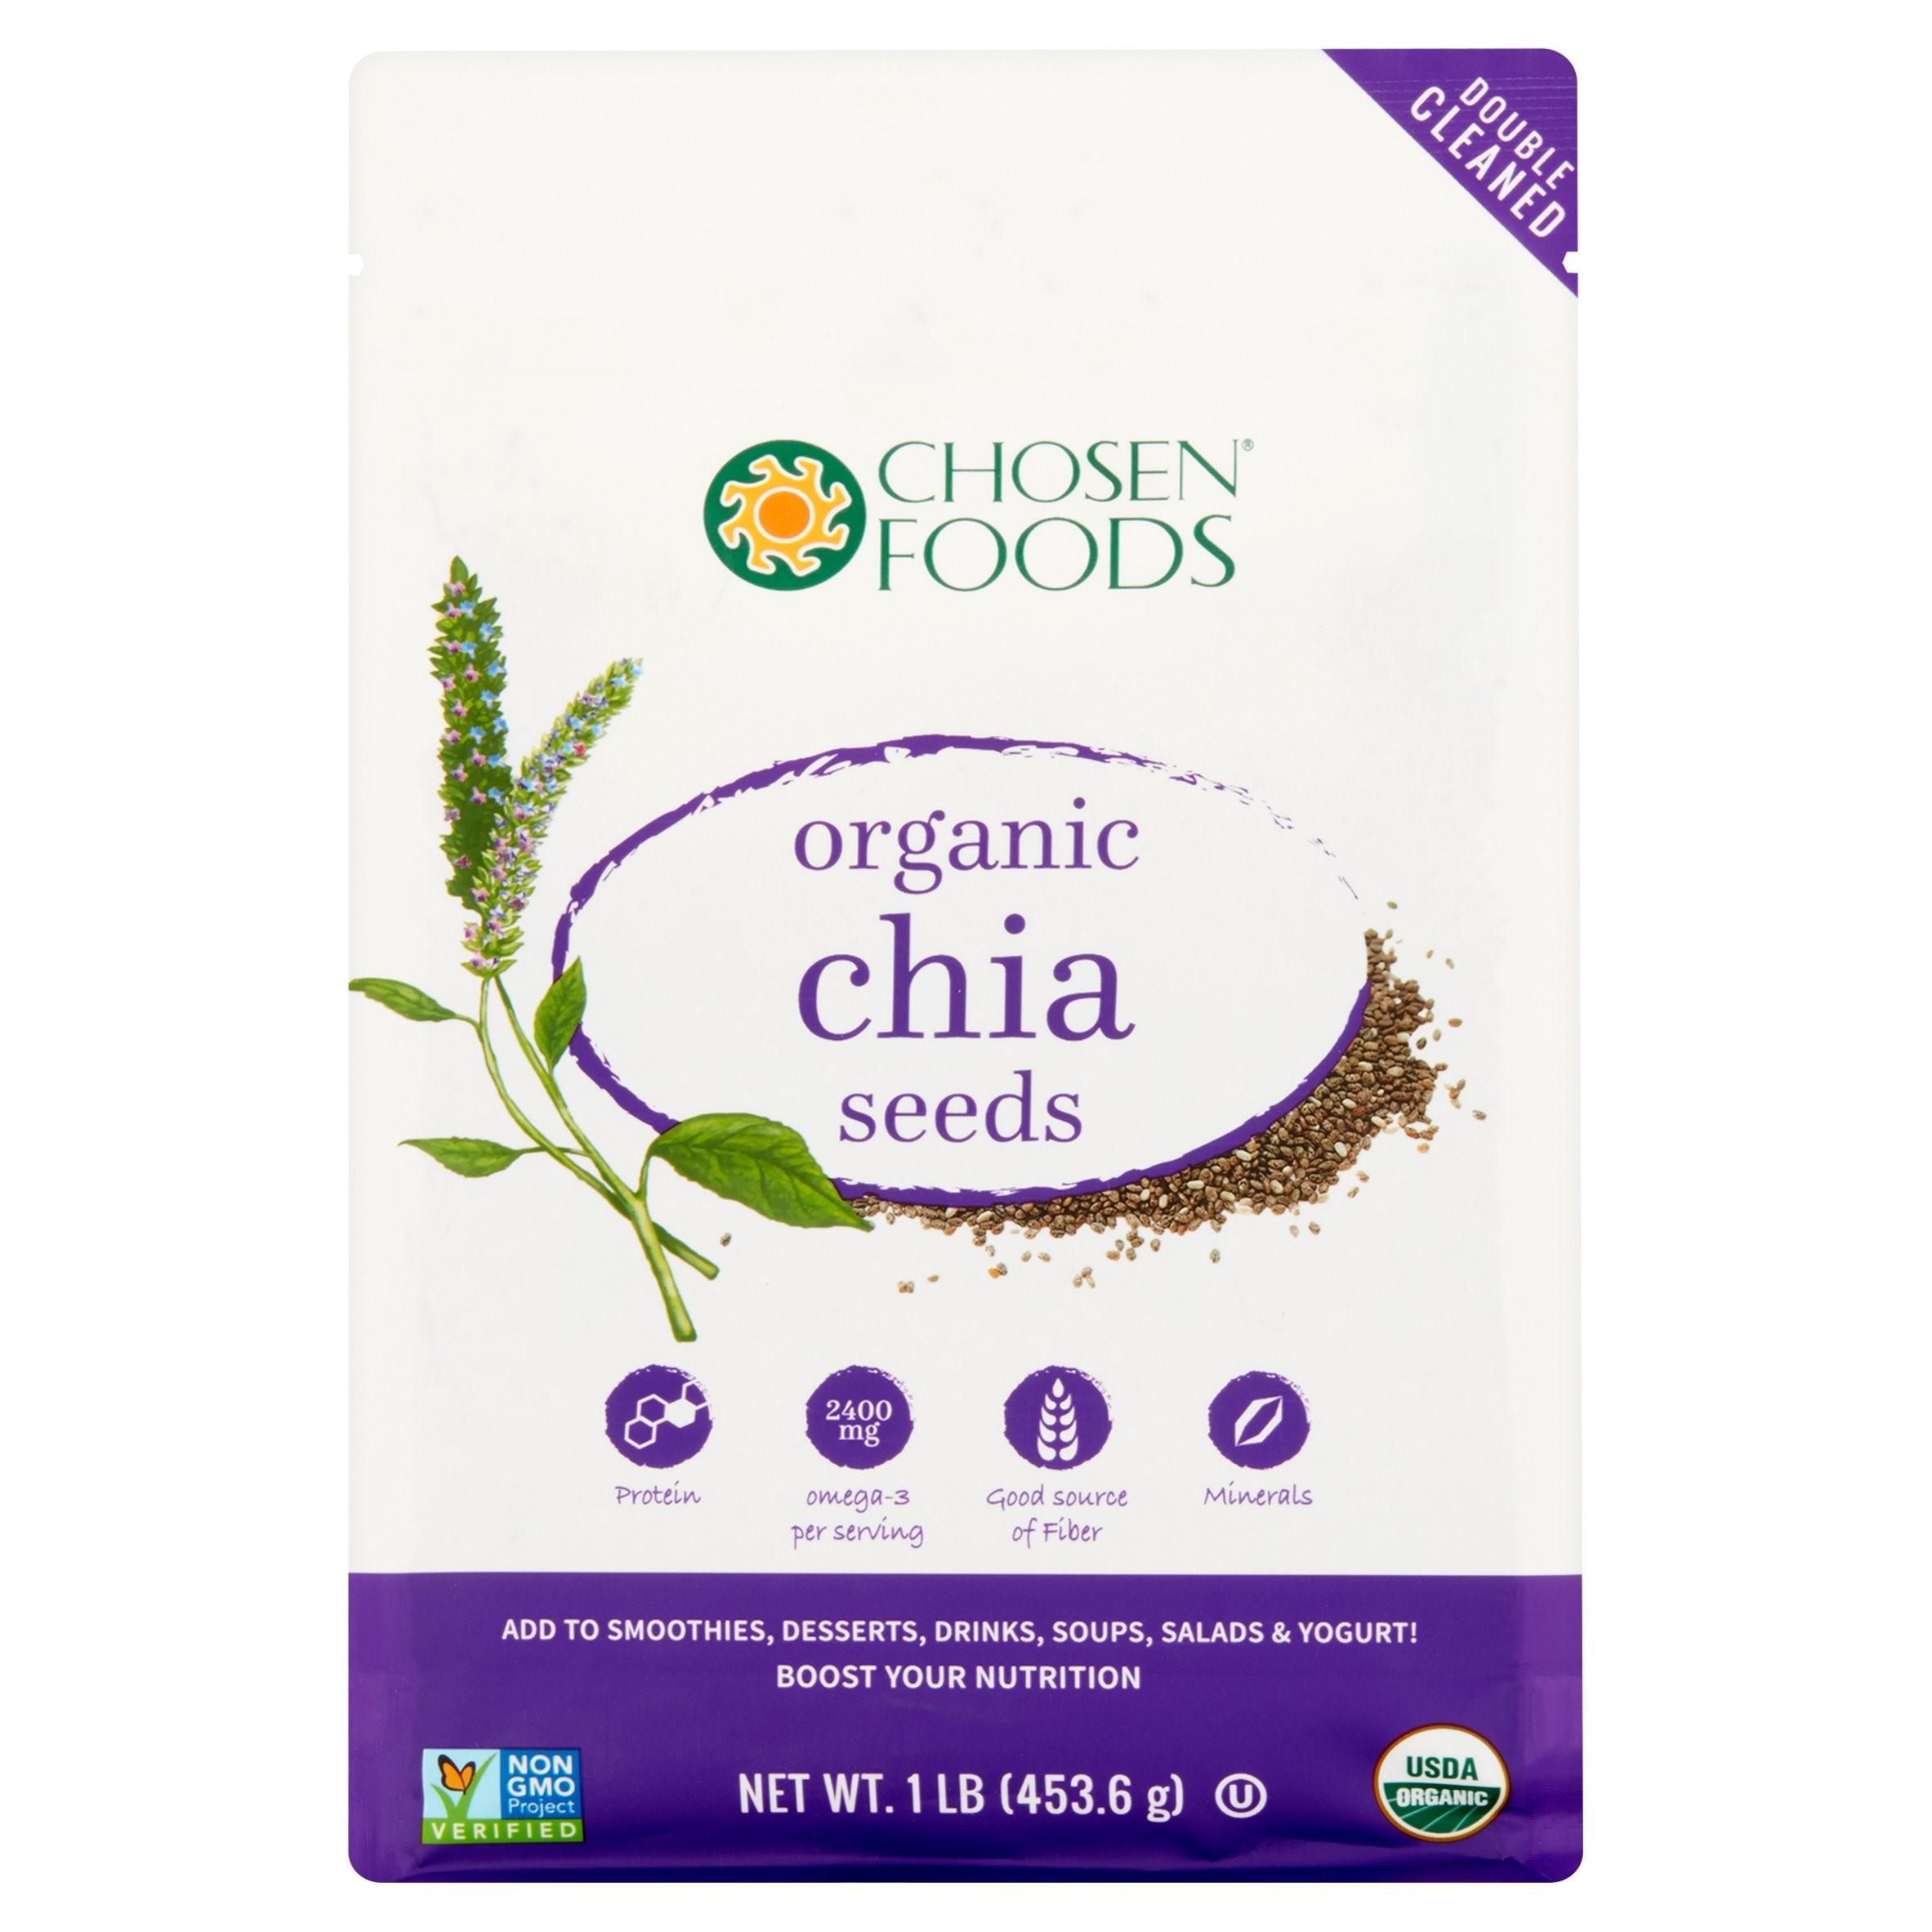 Chosen Foods Organic Chia Seeds, 1.0 Lb